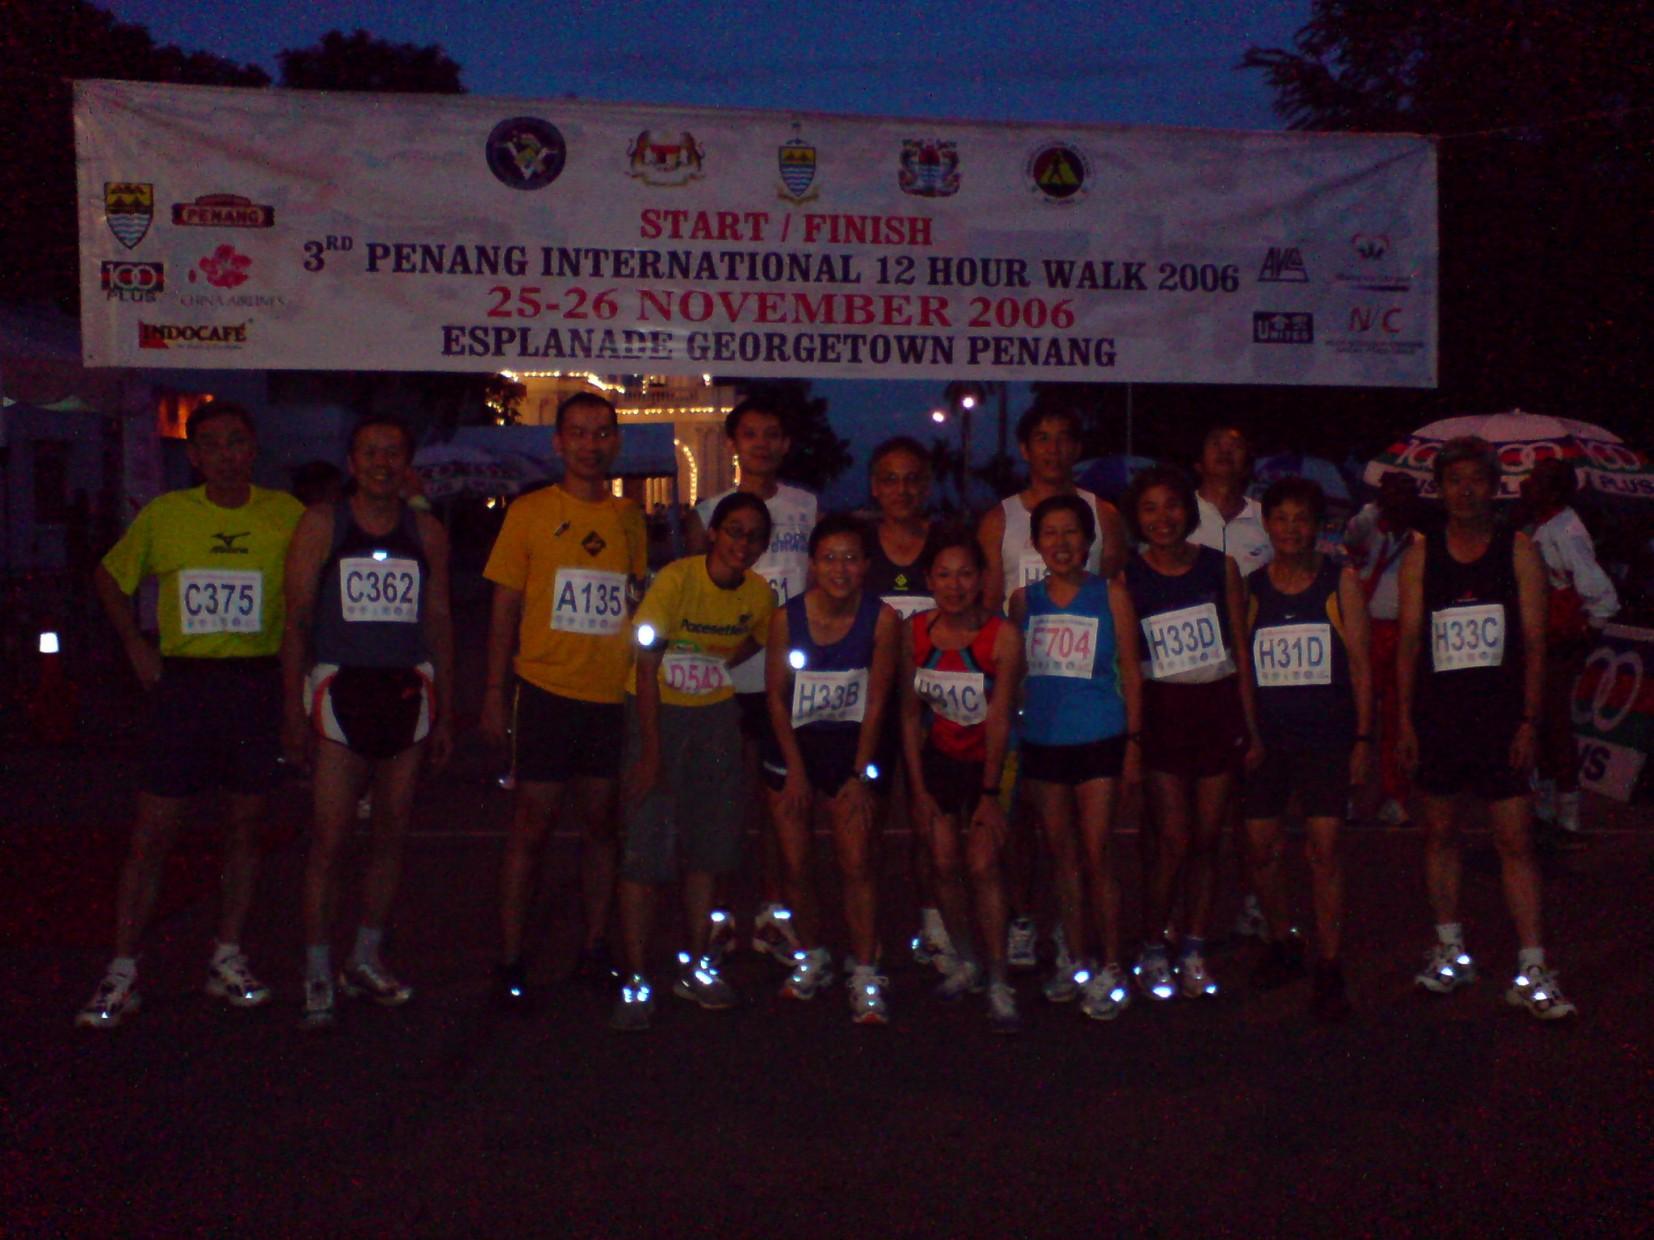 Penang International 12 hour Walk2006